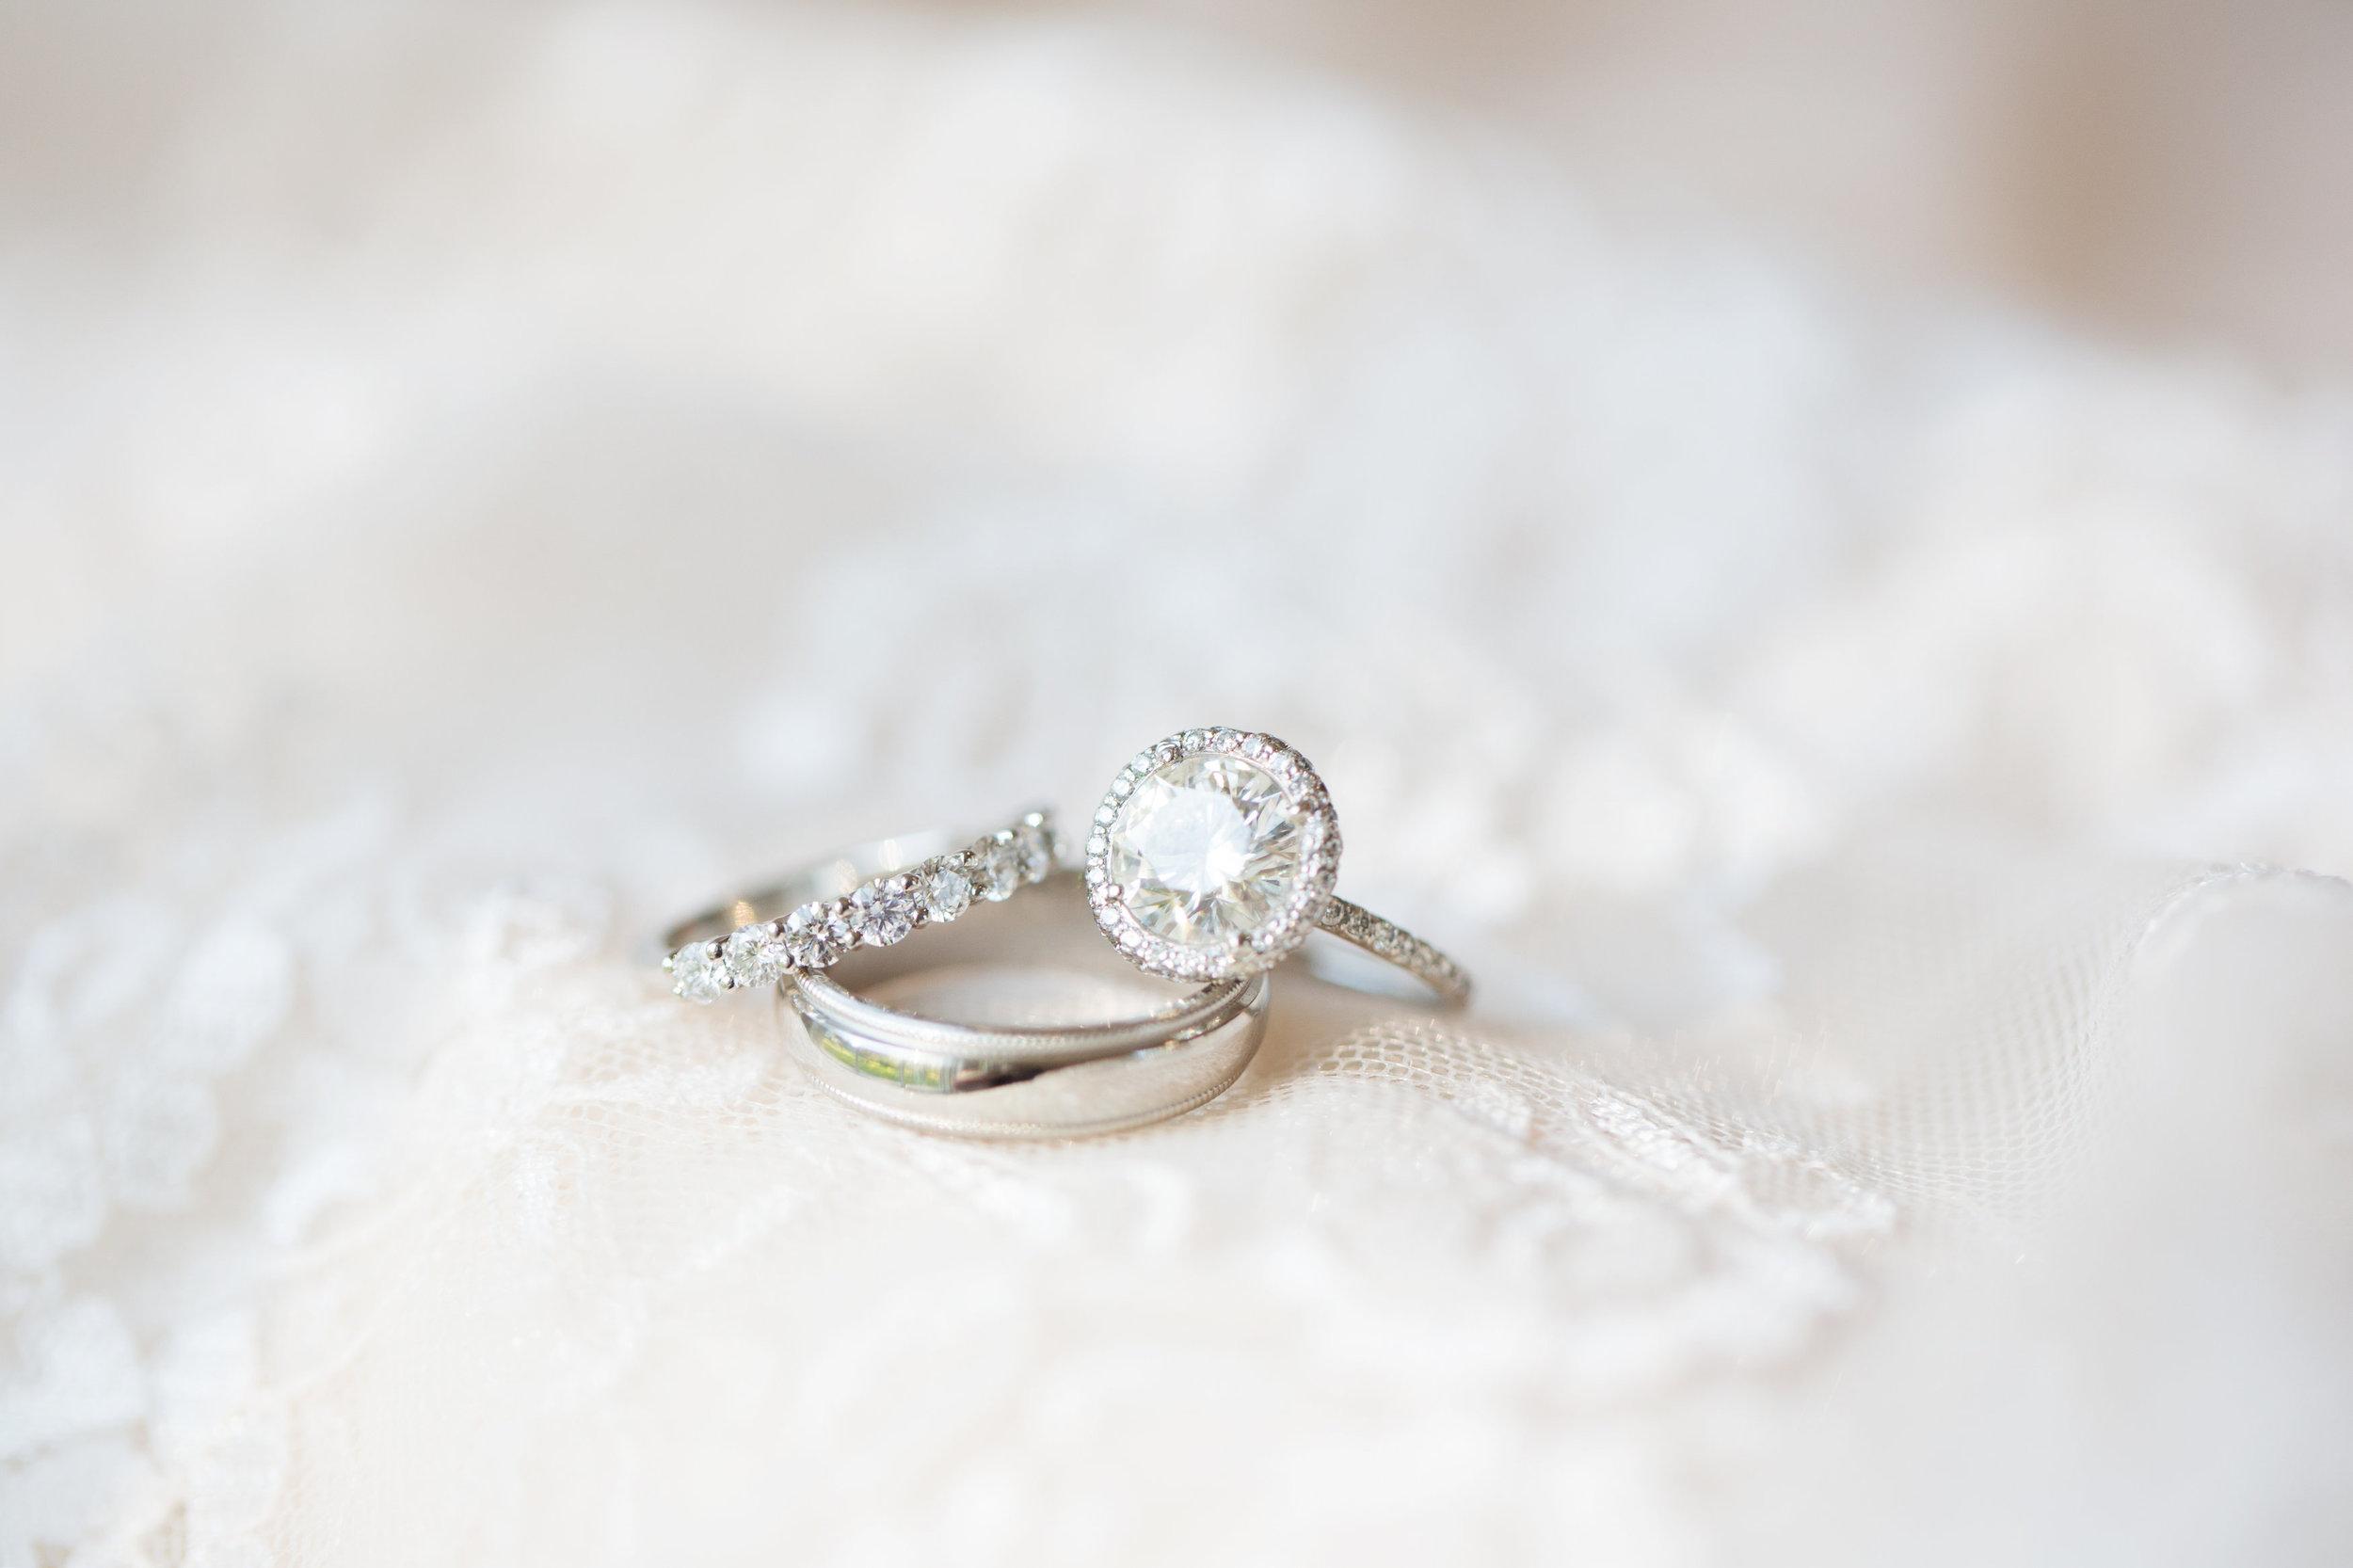 Coral Wedding, Standford, CT, Wedding, Bridal Party, Wedding Planning, CT Wedding Planner, Shoreline Wedding, Bride & Groom, Newlyweds